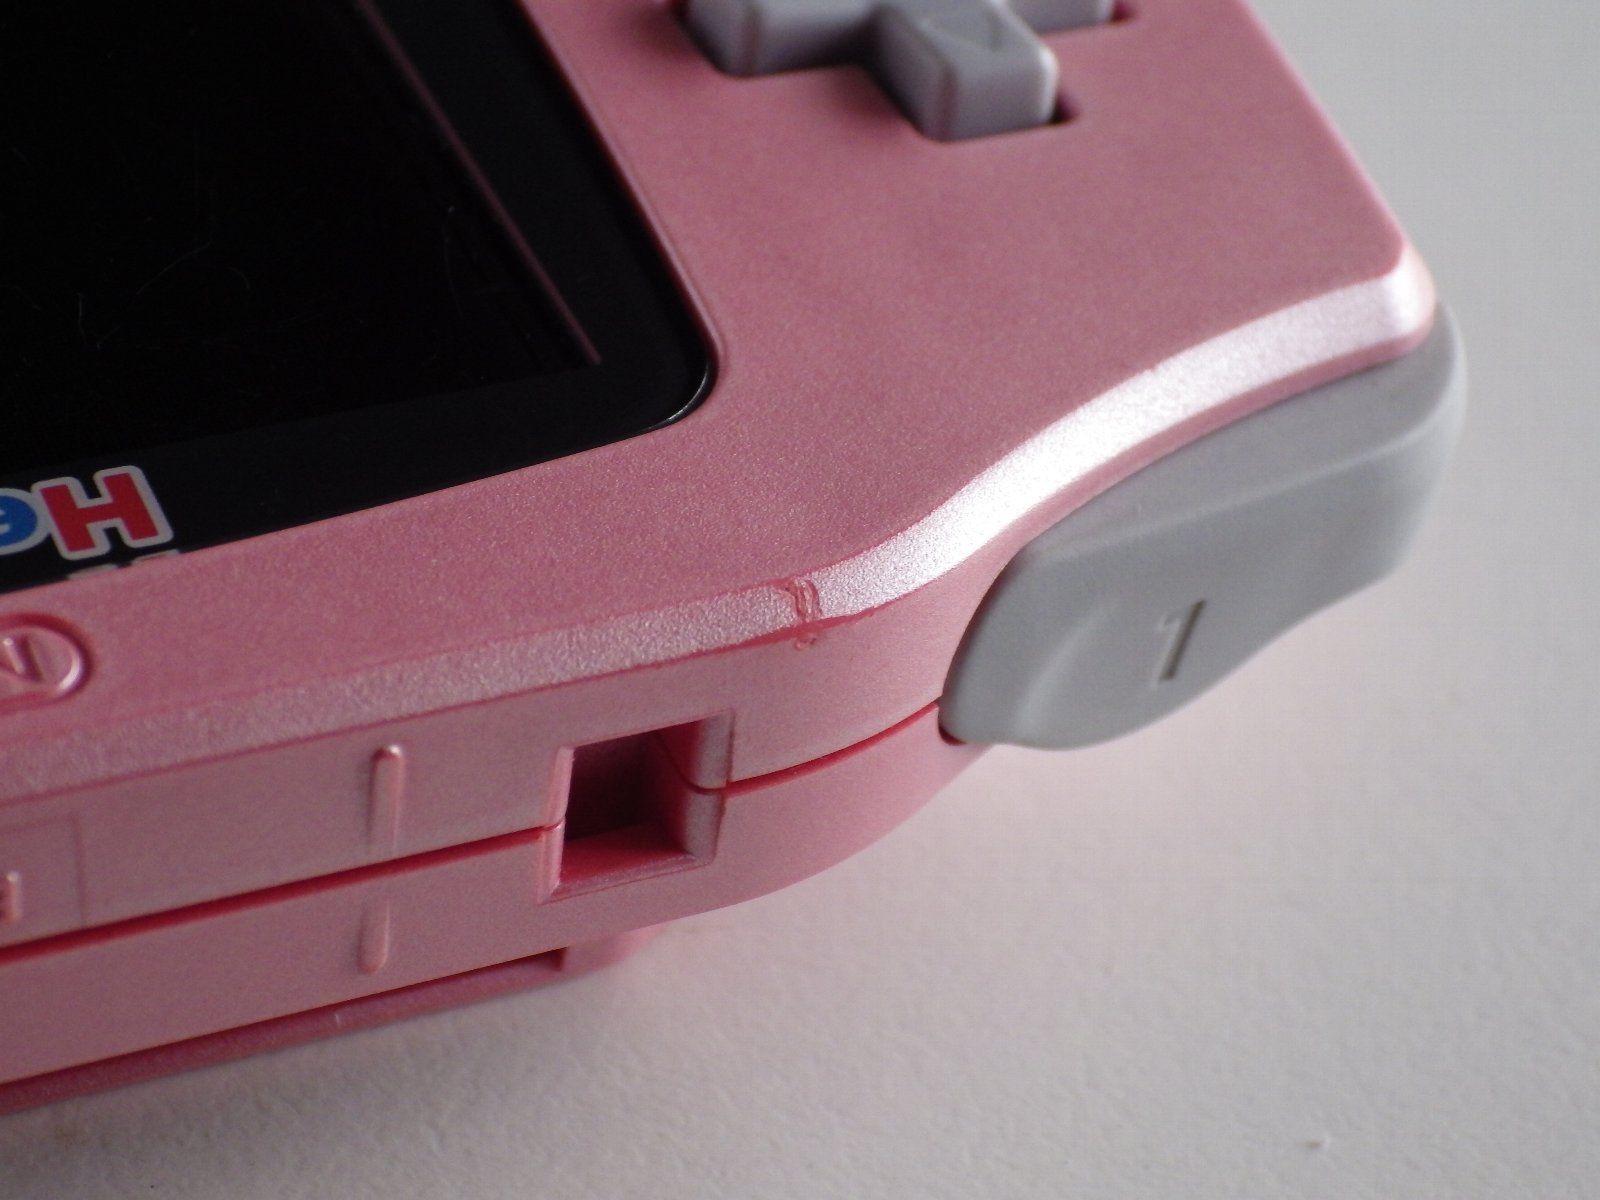 Gameboy Advance, Hello Kitty